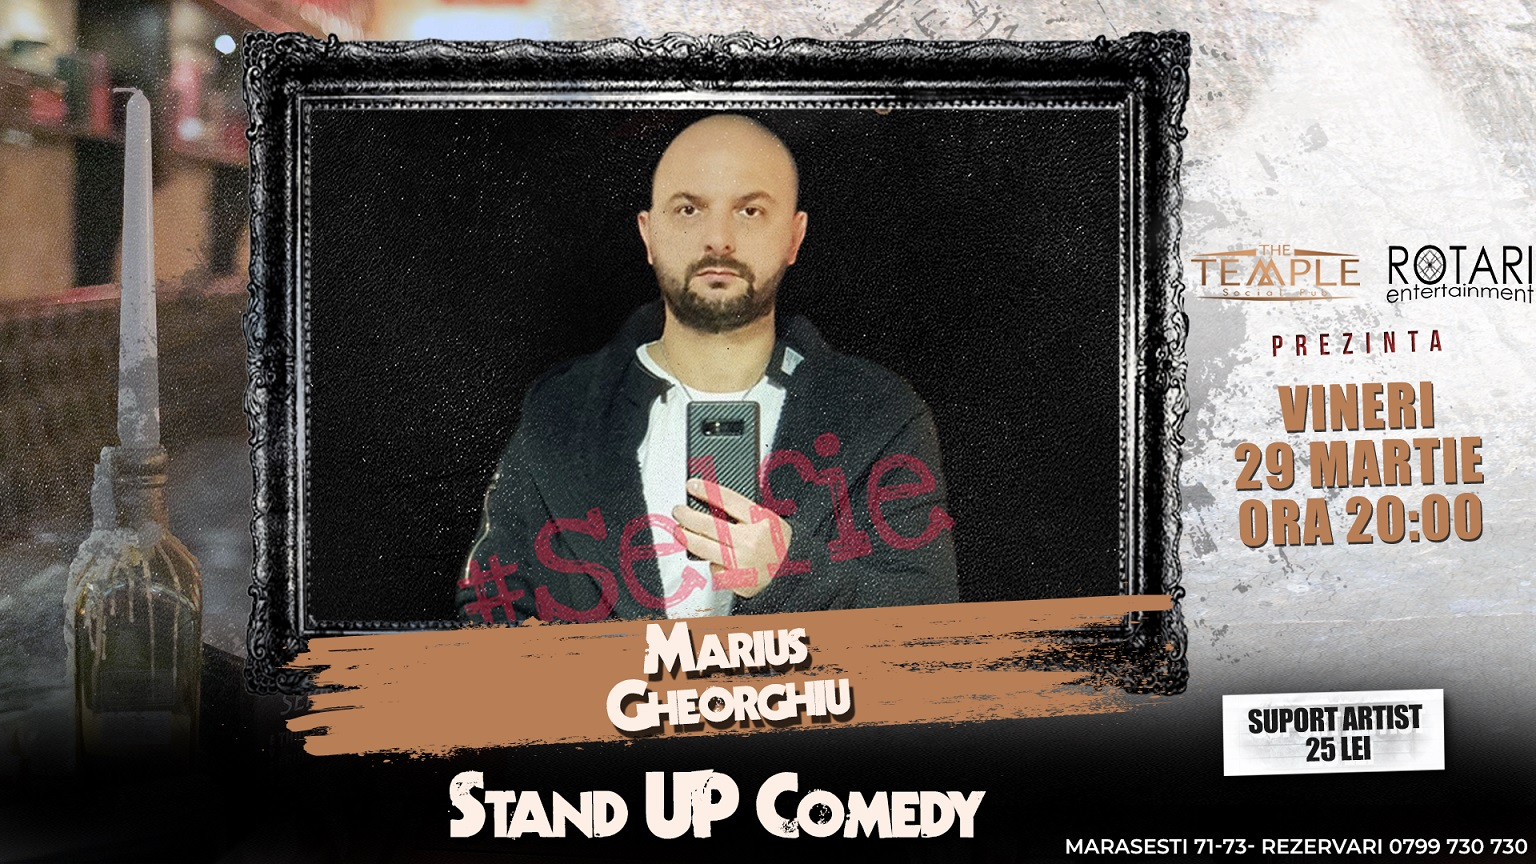 Spectacol de Stand Up Comedy cu Marius Gheorghiu, la The Temple Social Pub